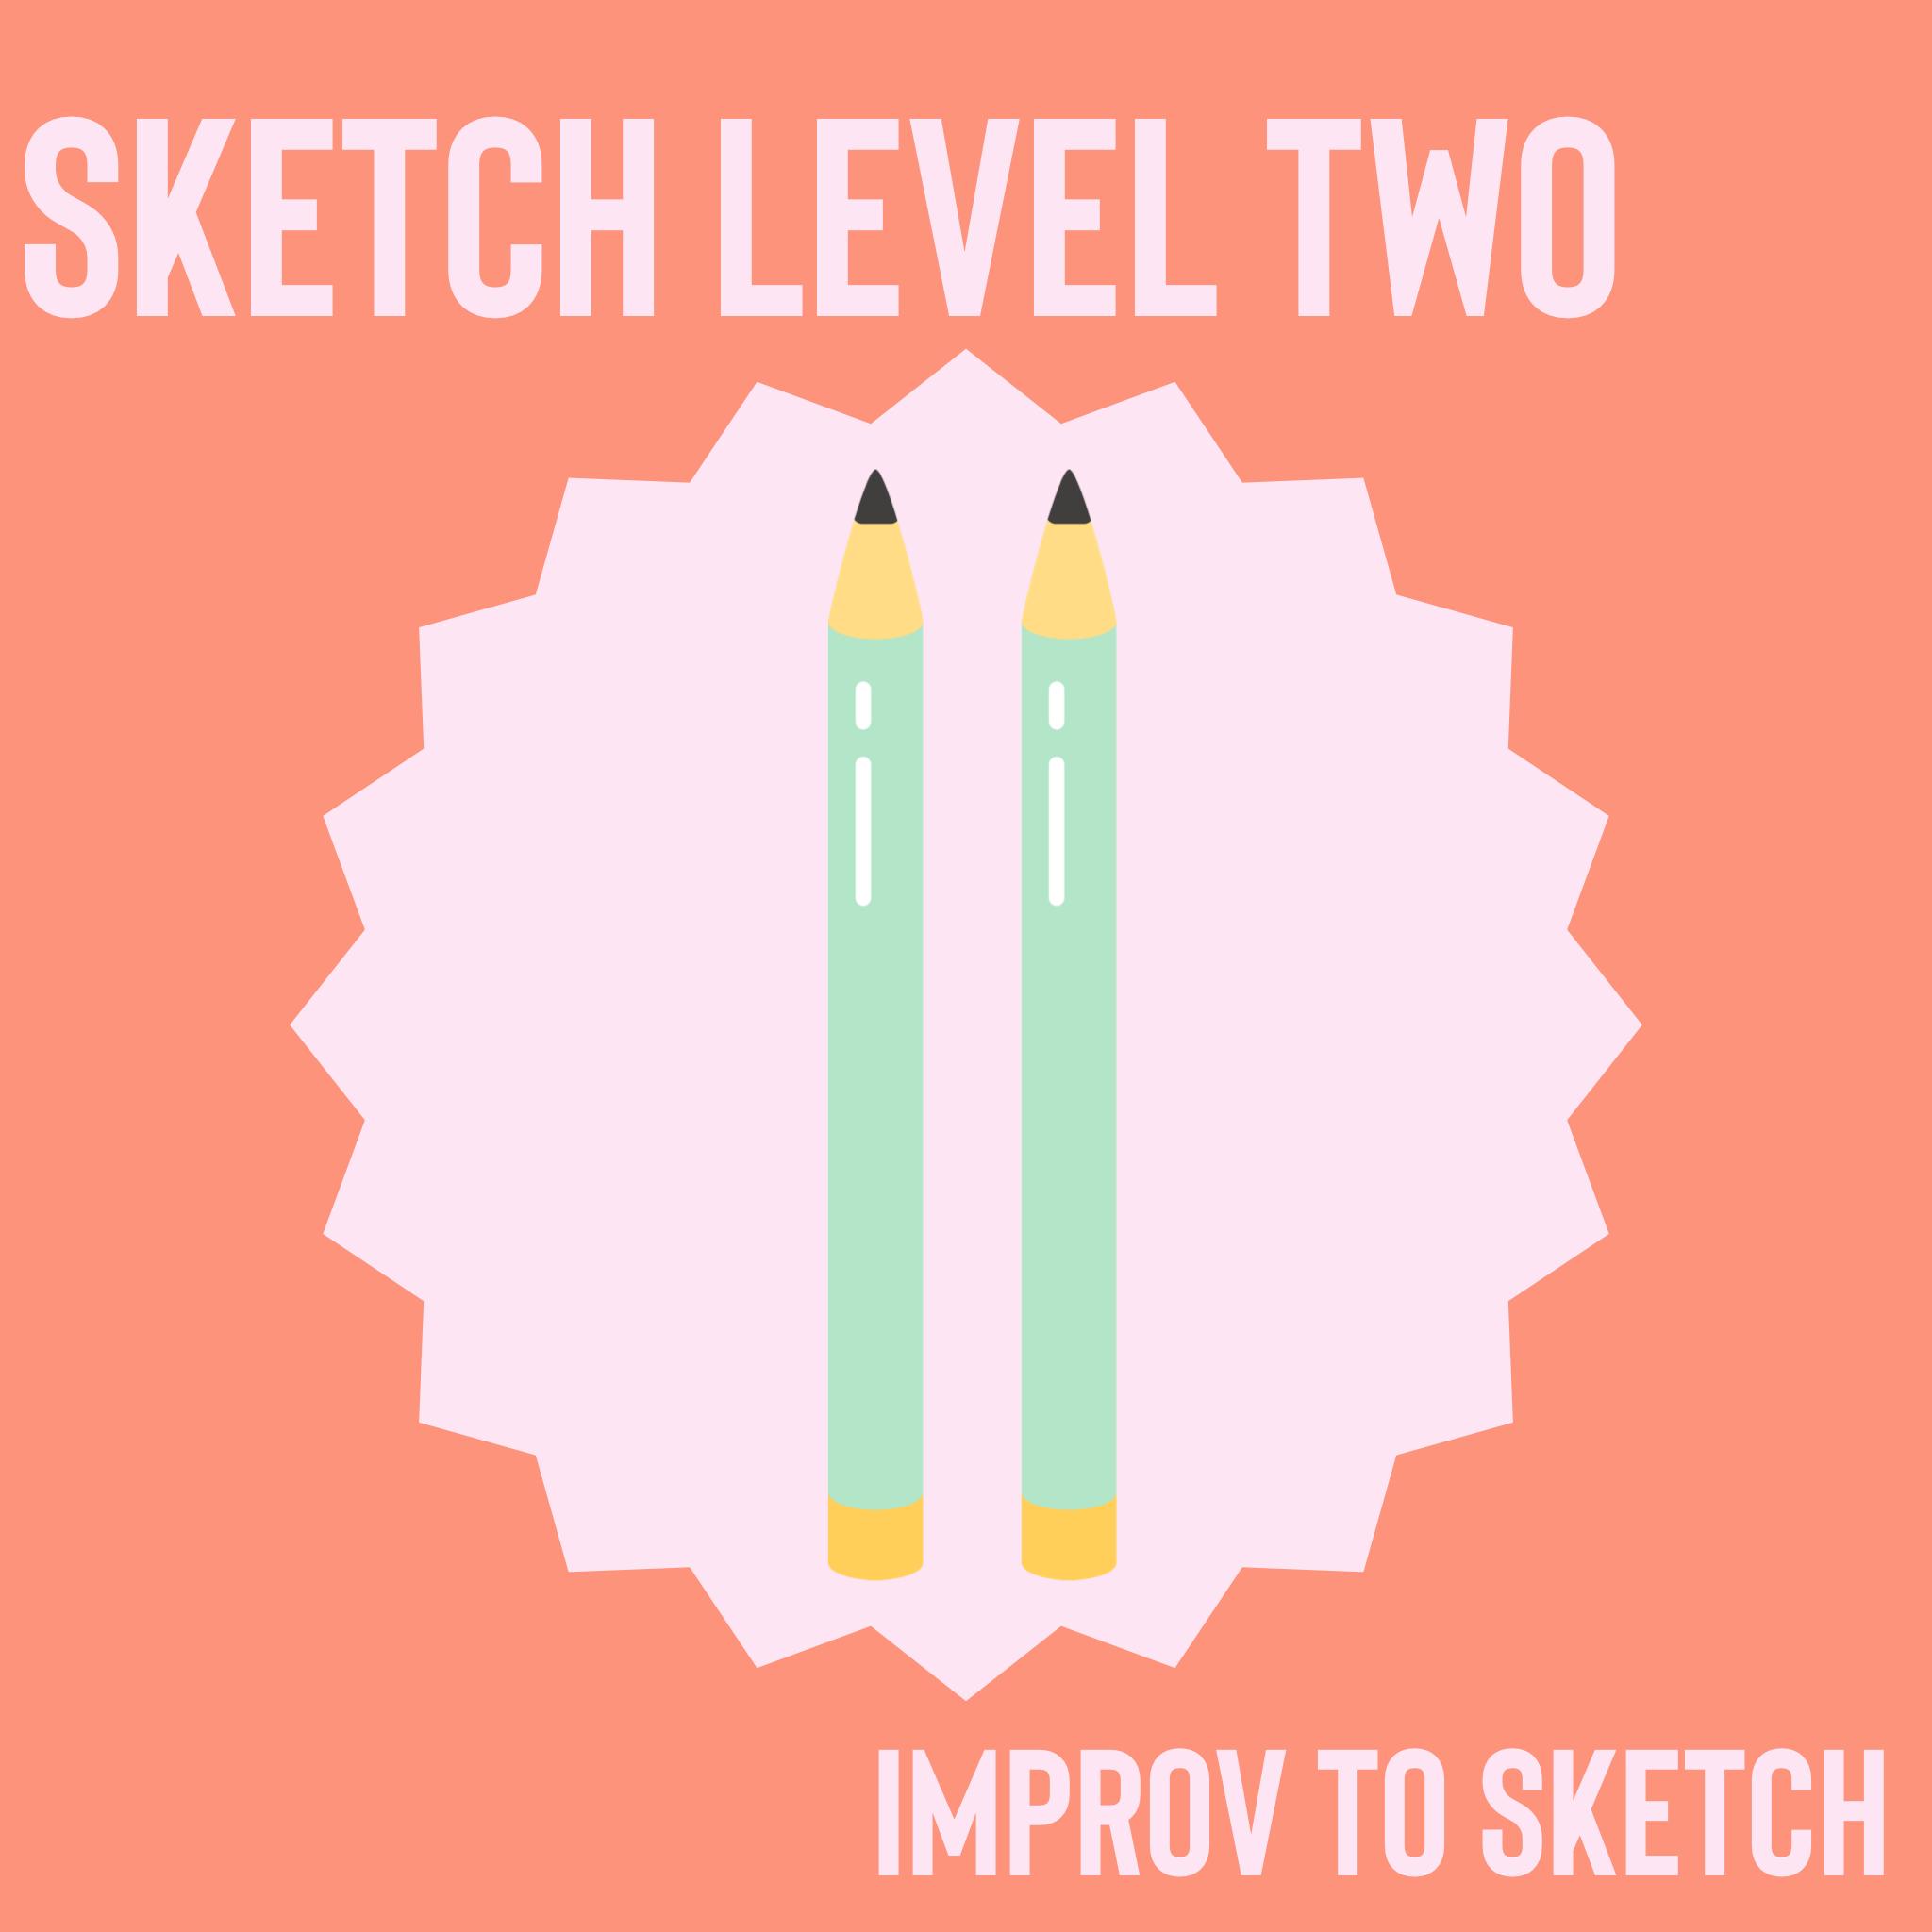 improv to sketch